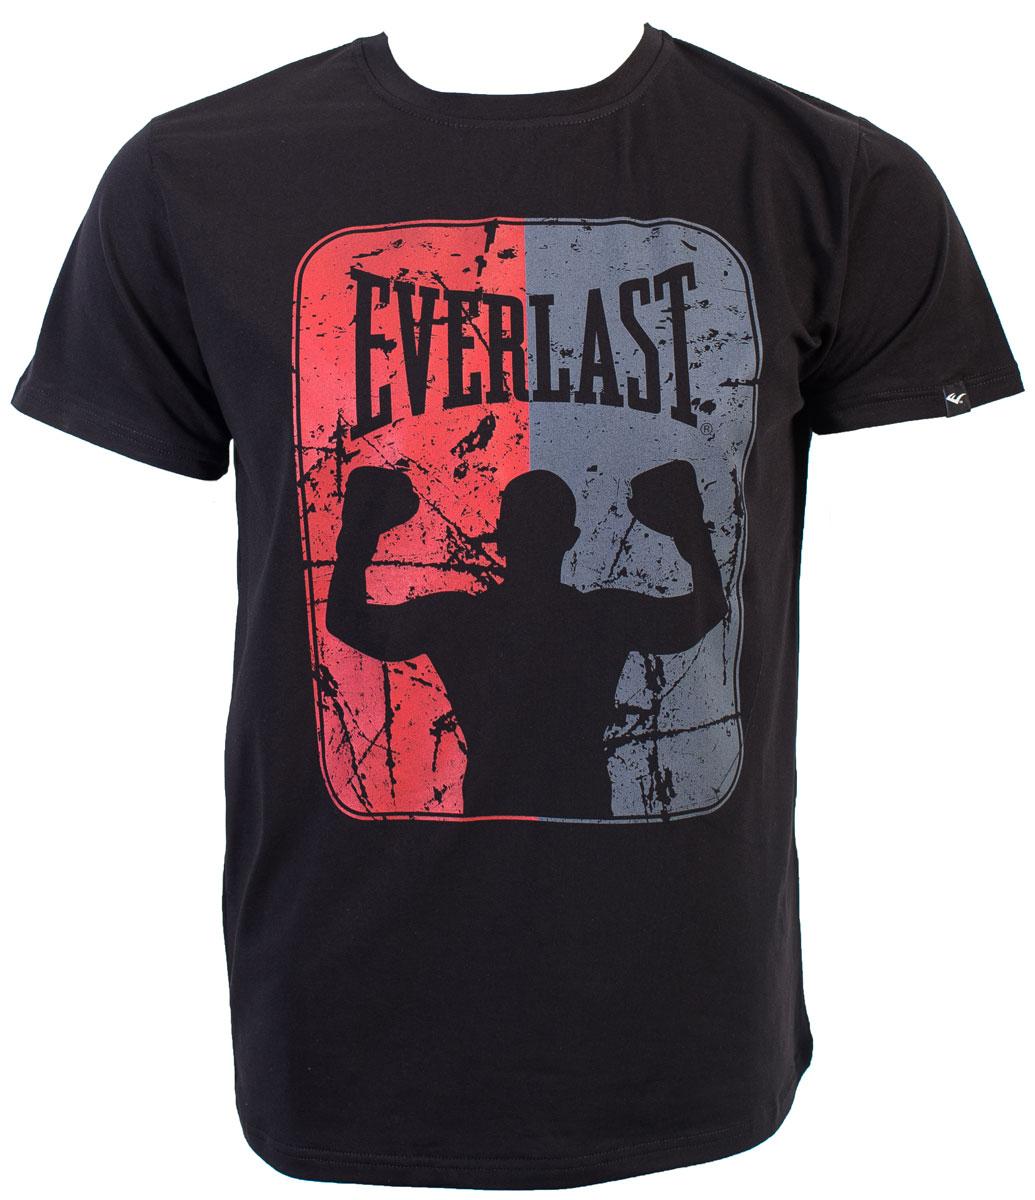 Футболка мужская Everlast Boxer, цвет: черный. RE0034. Размер XXL (54/56) футболка мужская mitre цвет желтый tt29019 размер xxl 54 56